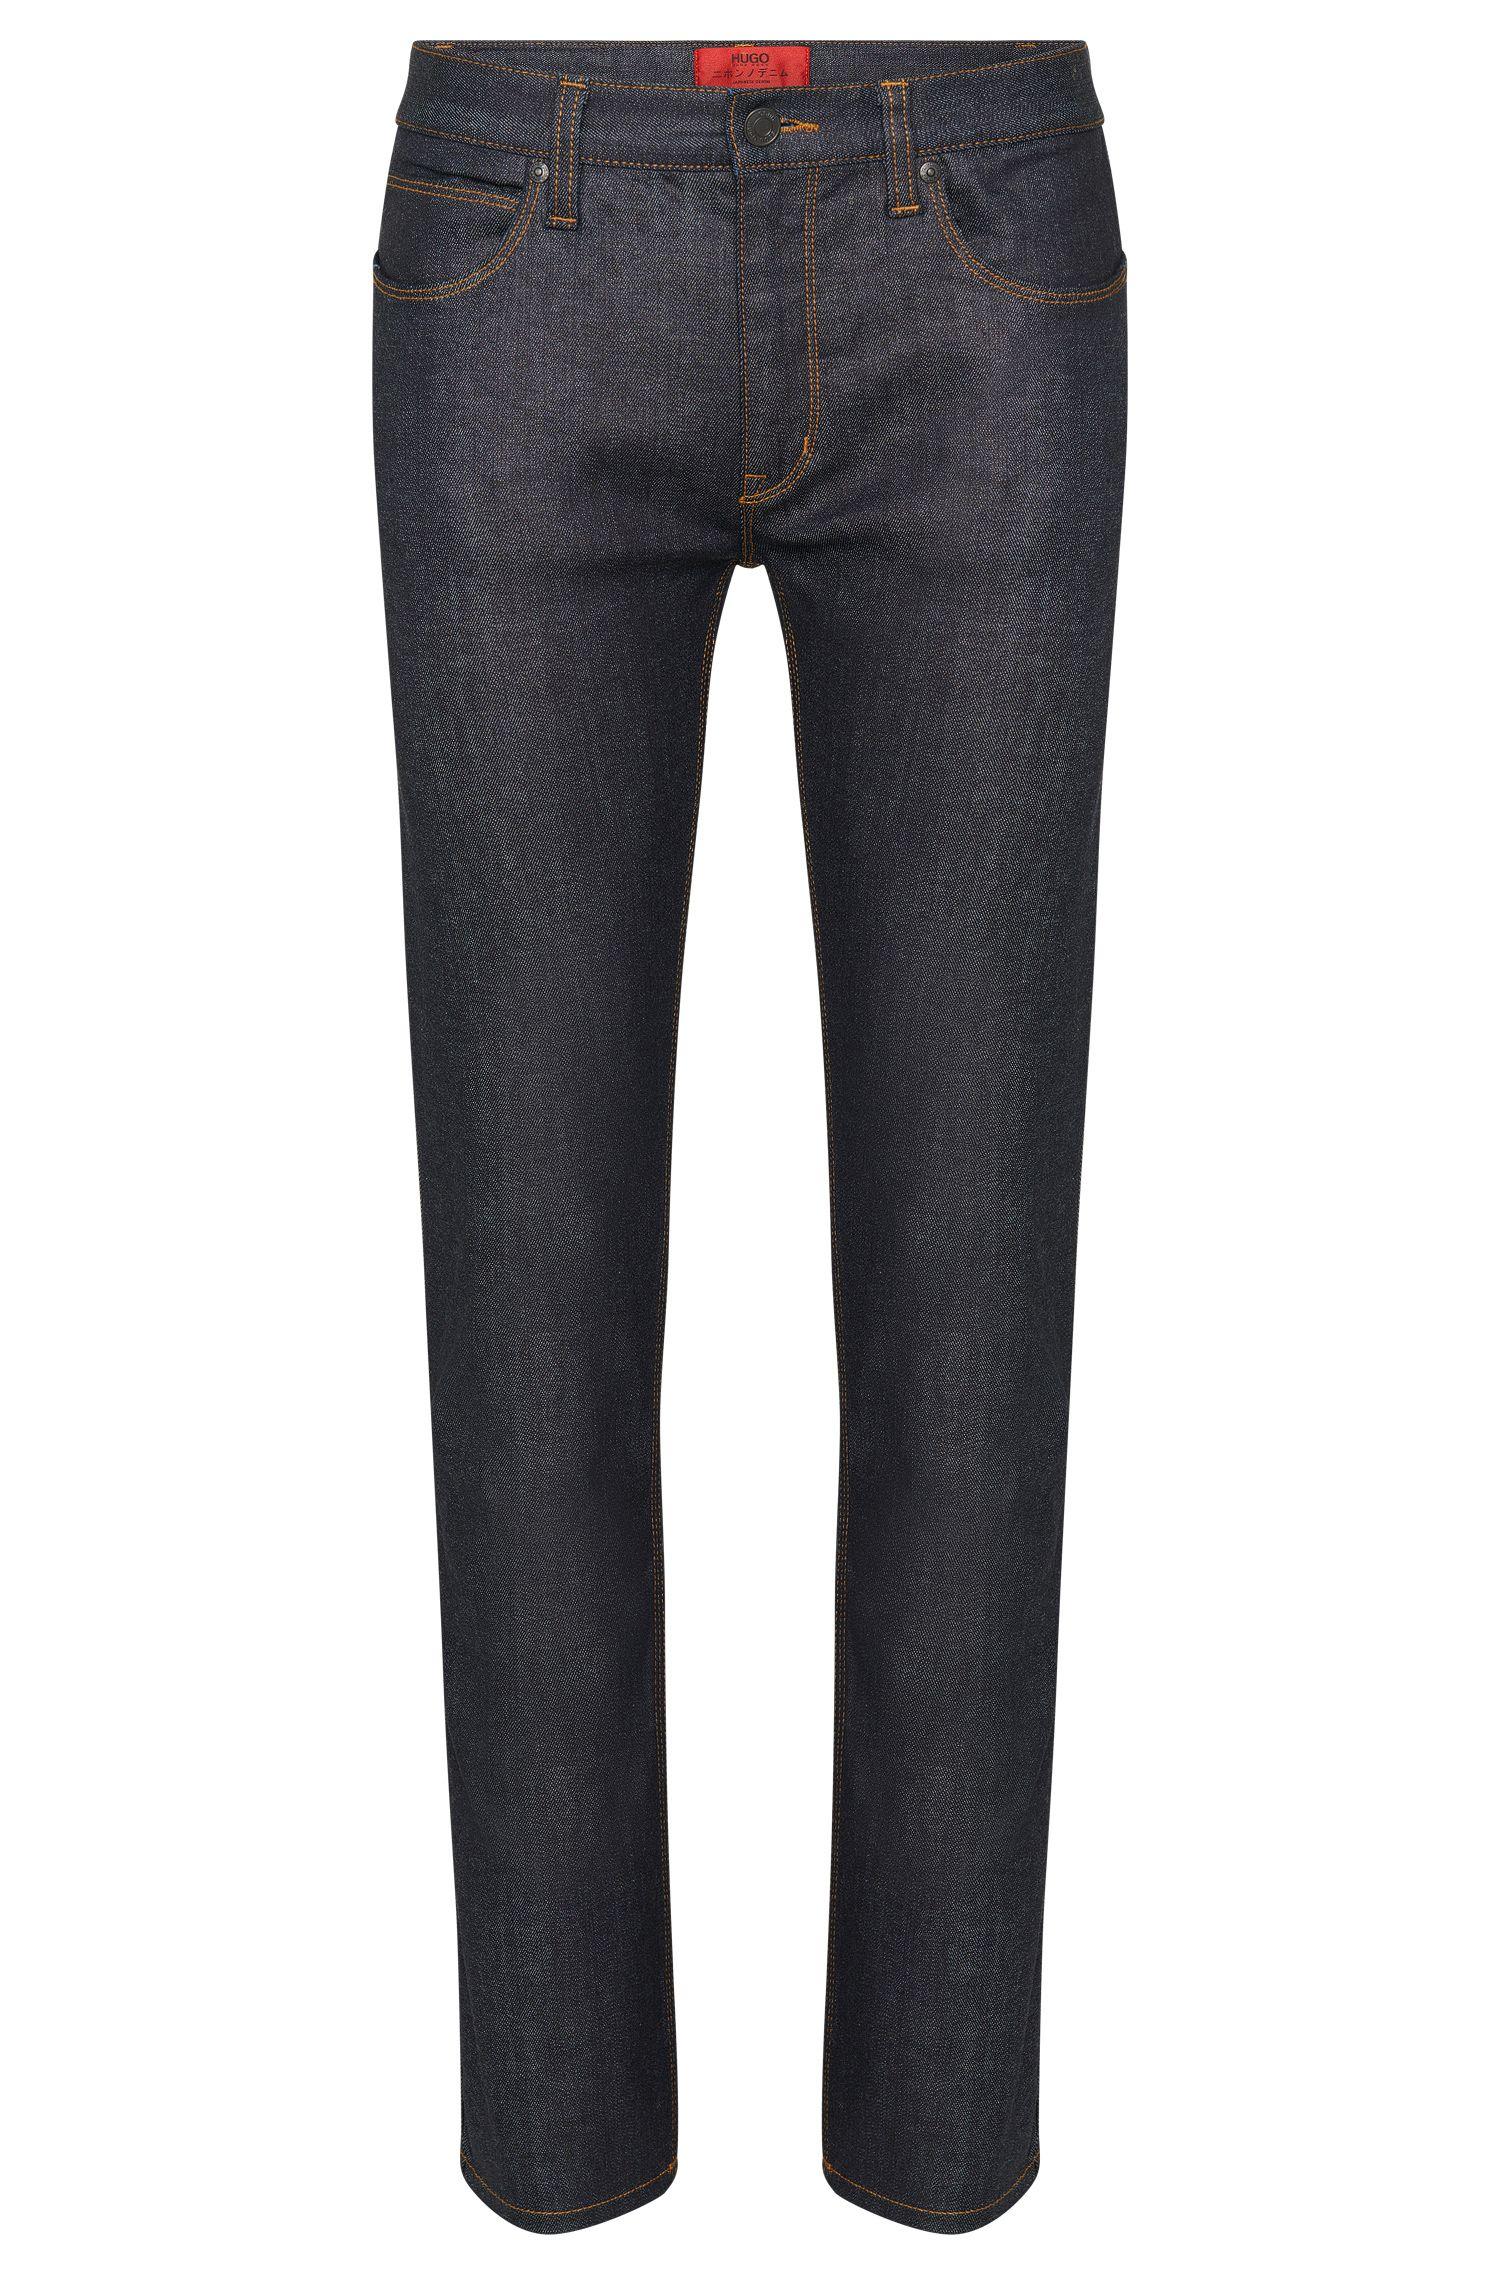 'HUGO 708' | Slim Fit, 10 oz Stretch Cotton Japanese Denim Jeans